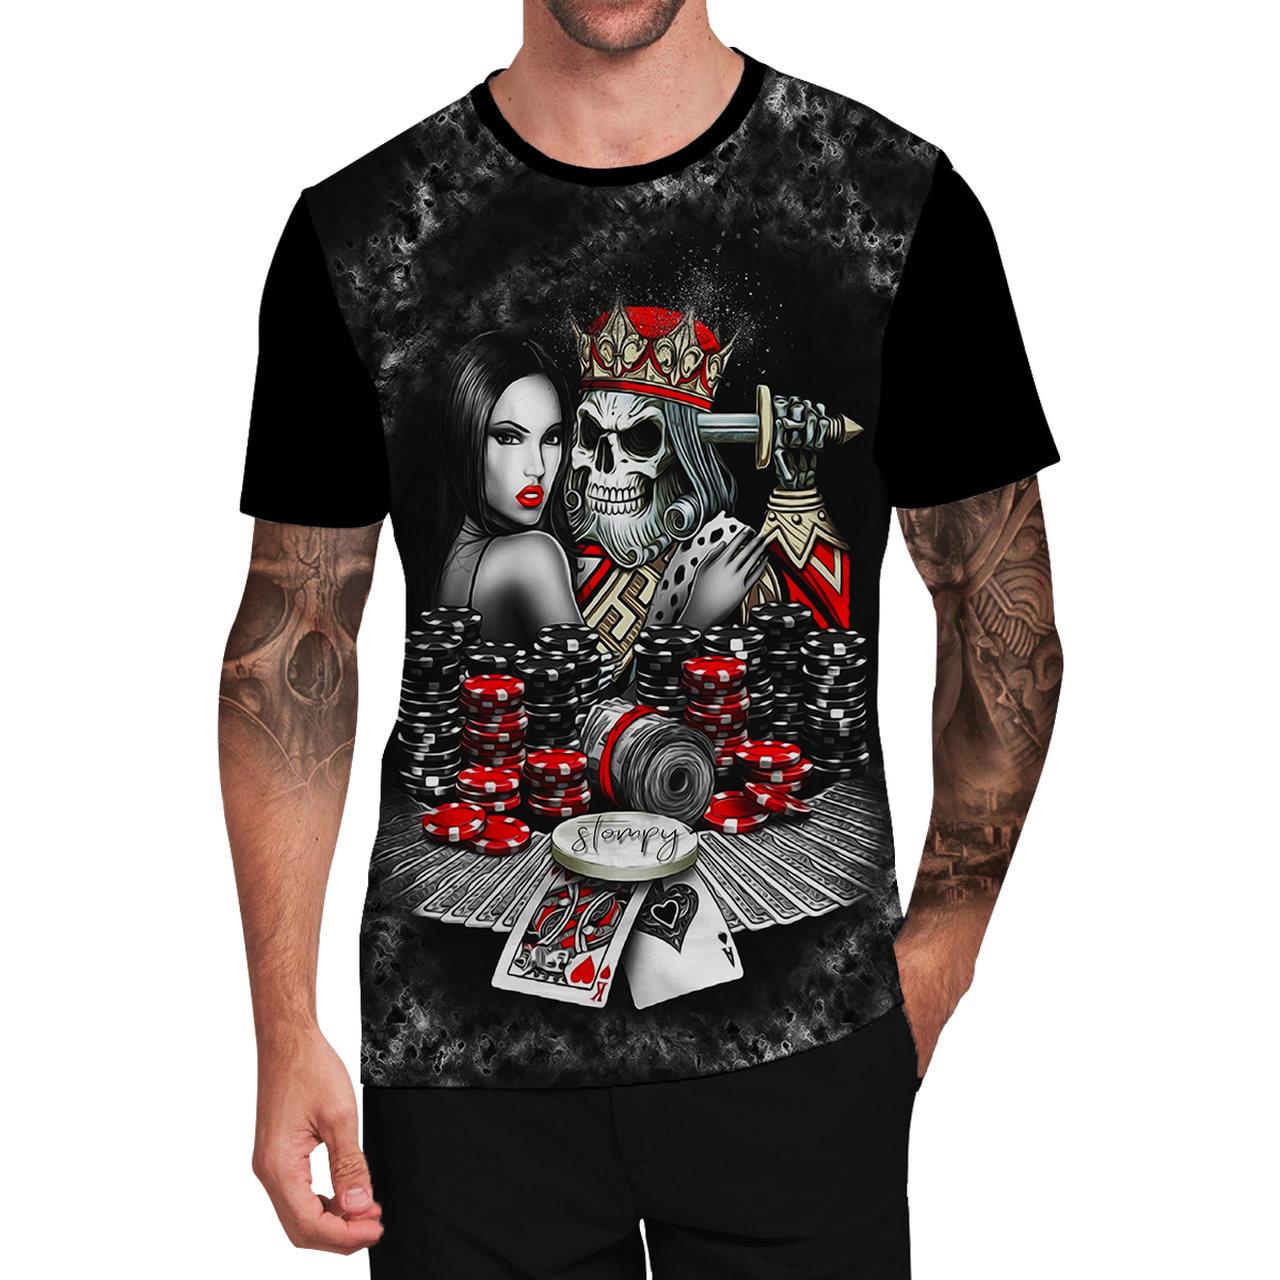 Stompy Camiseta Tattoo Tatuagem Caveira Skull 108